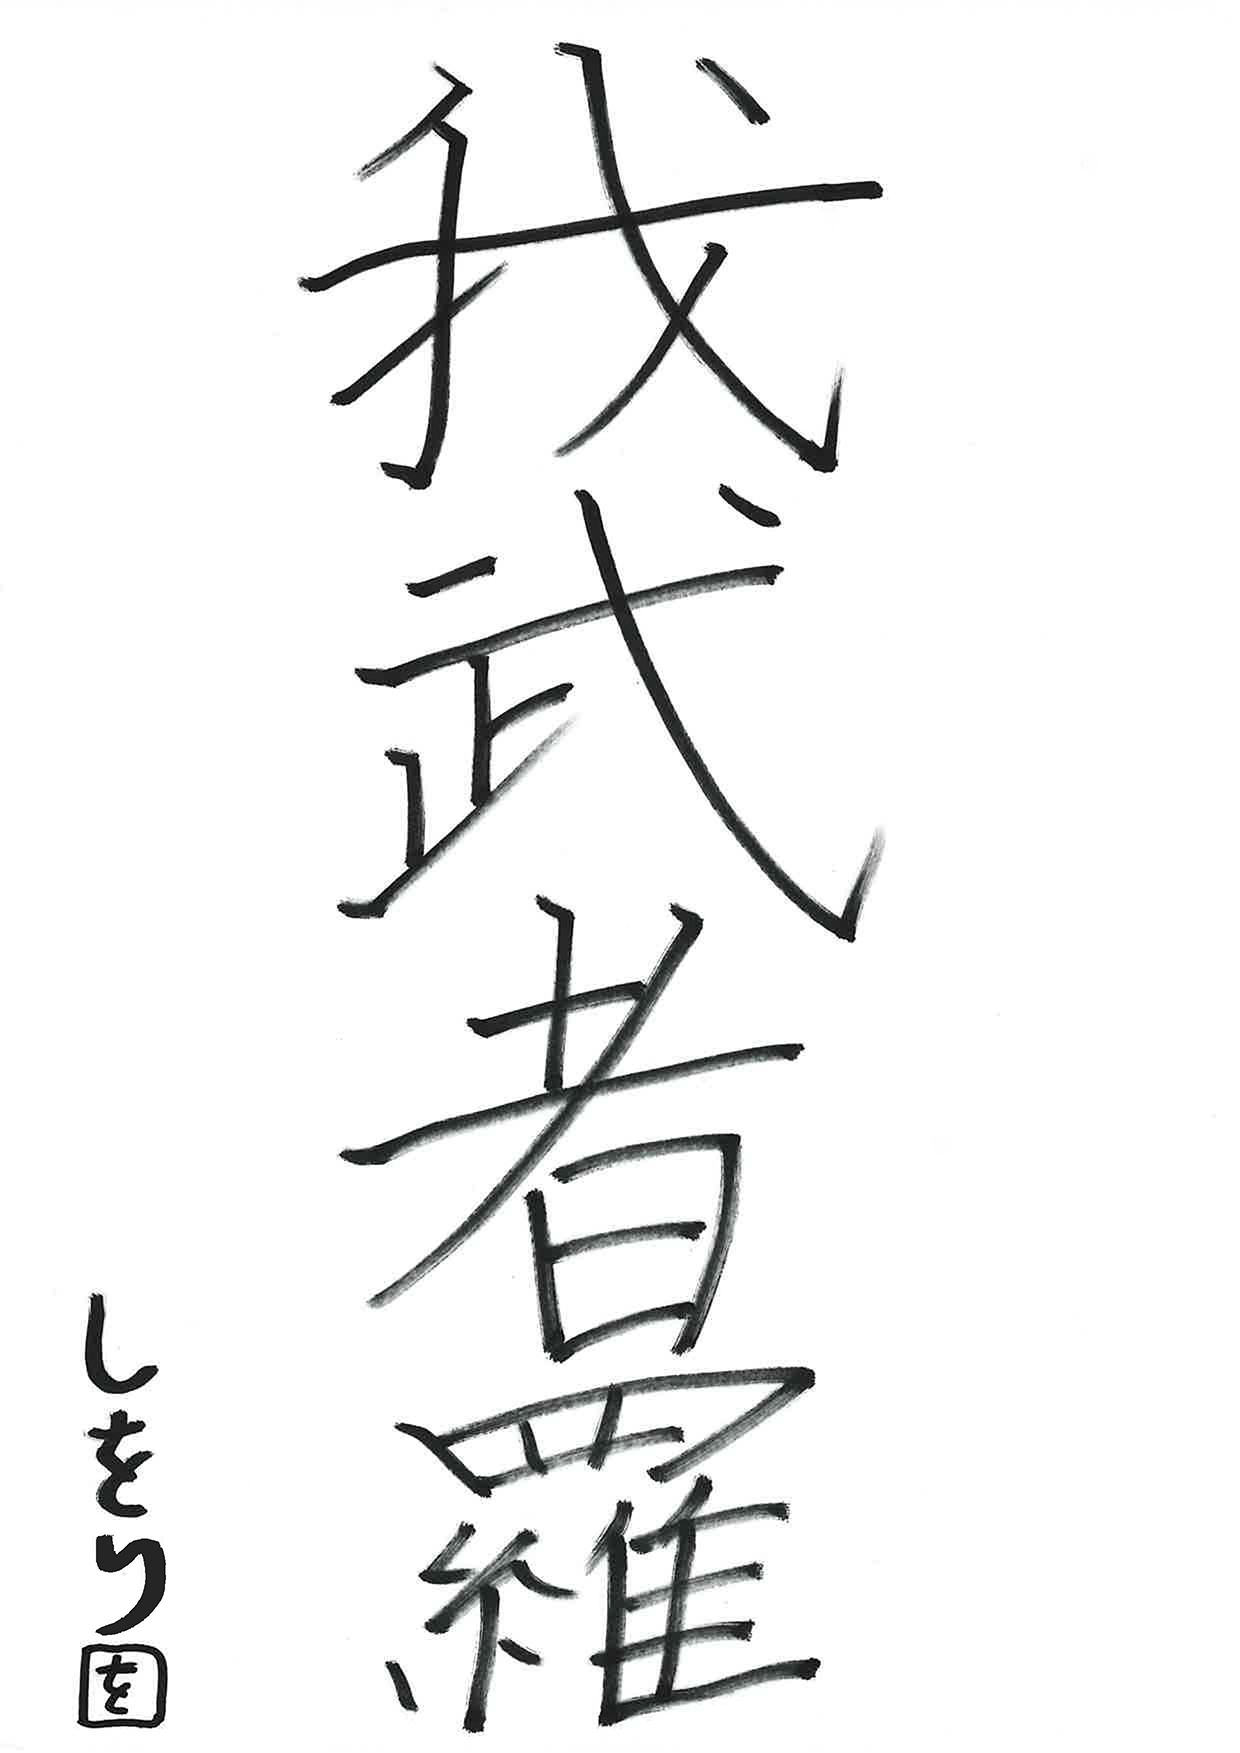 【欅坂46】佐藤詩織応援スレ★8【美術】YouTube動画>50本 ->画像>402枚